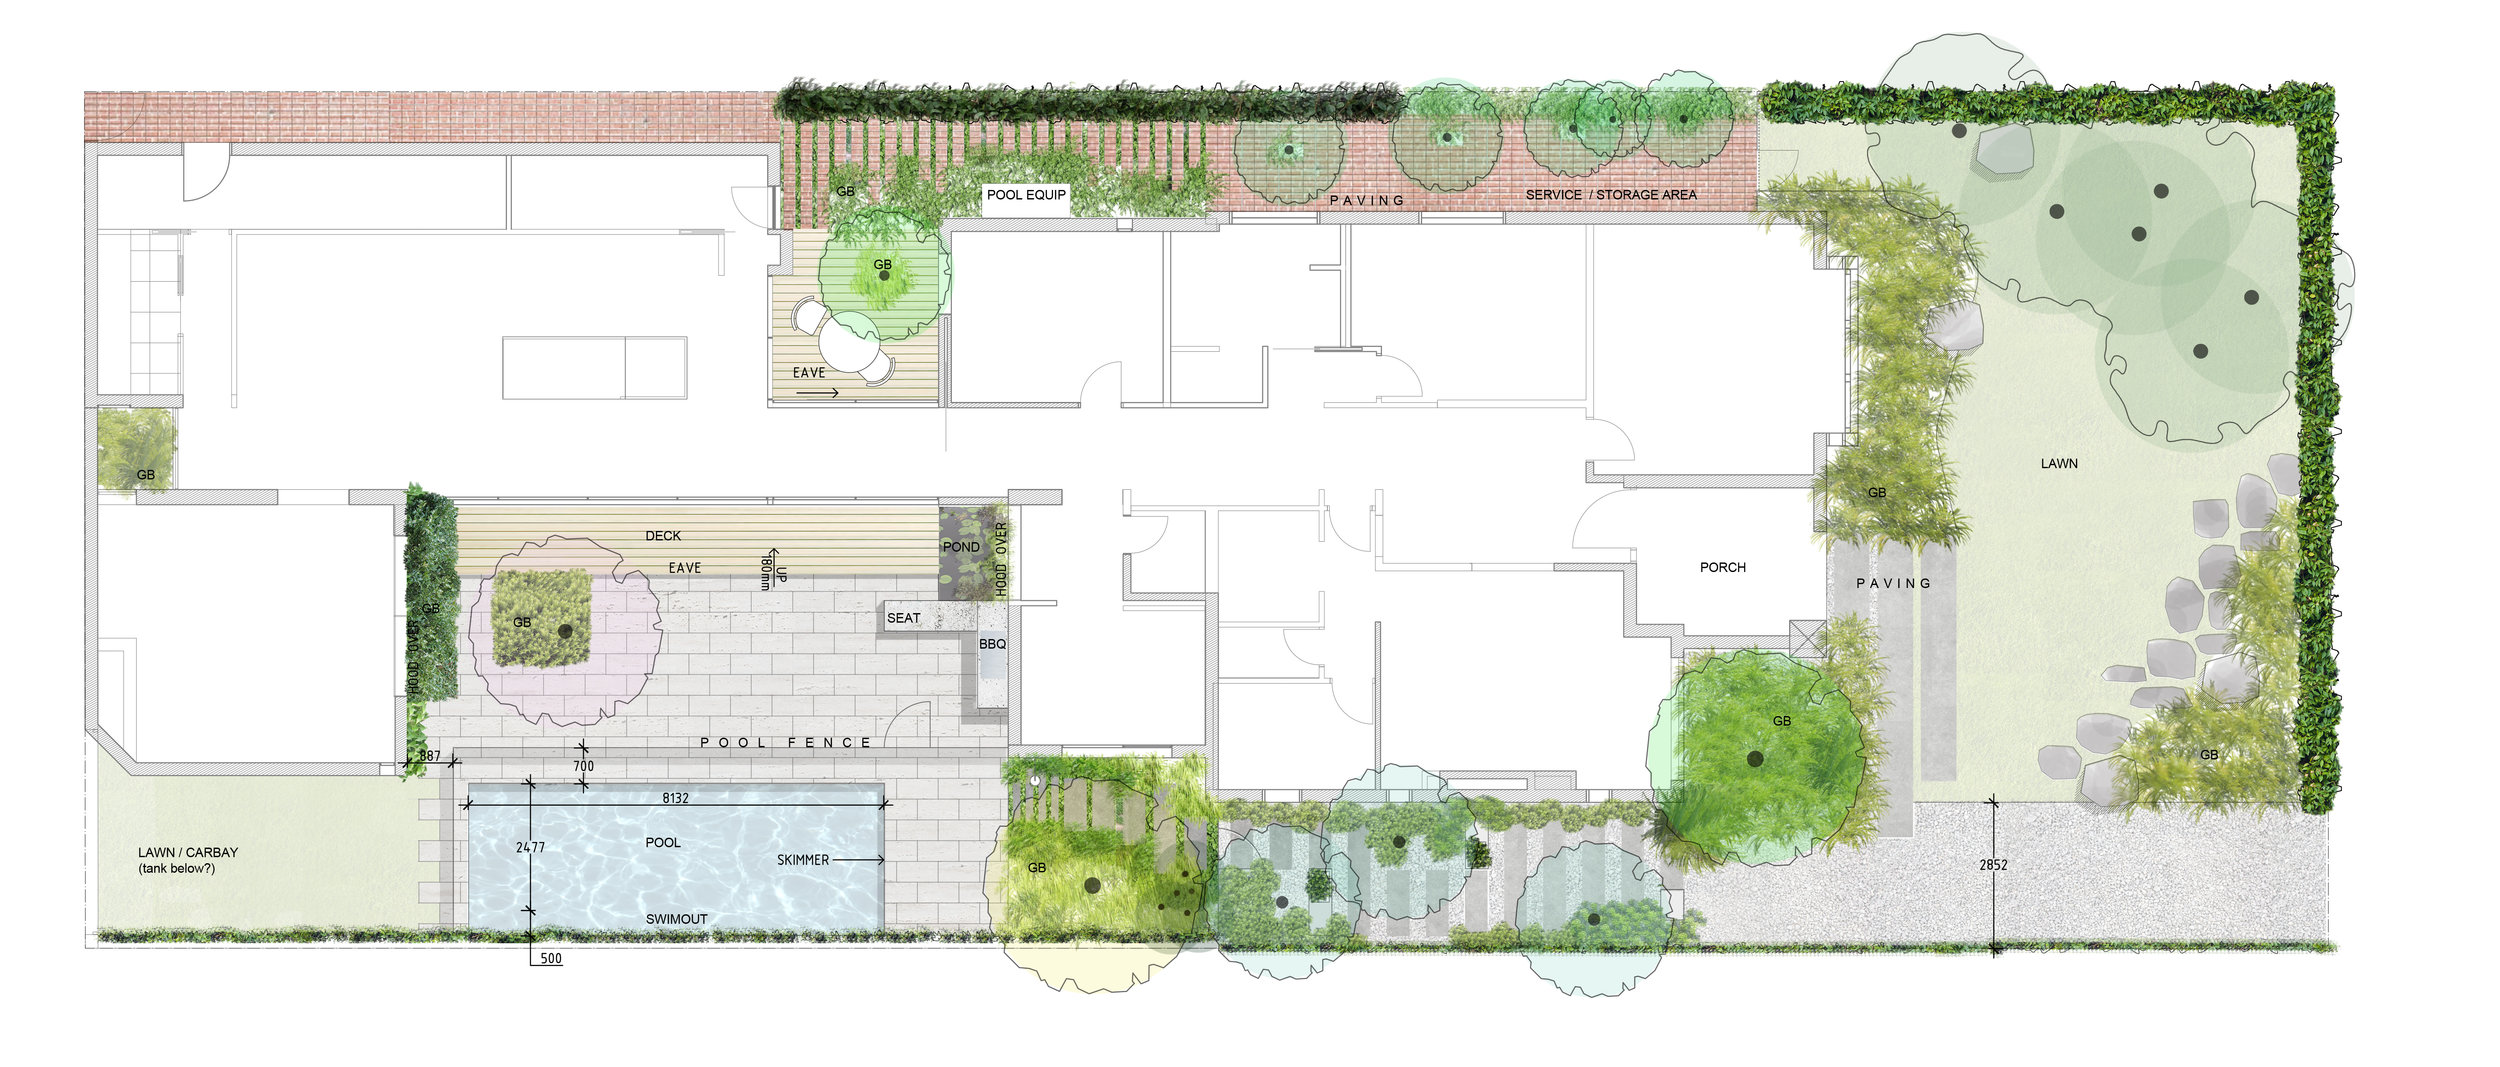 Beaver_MalvernEast_Plan.jpg